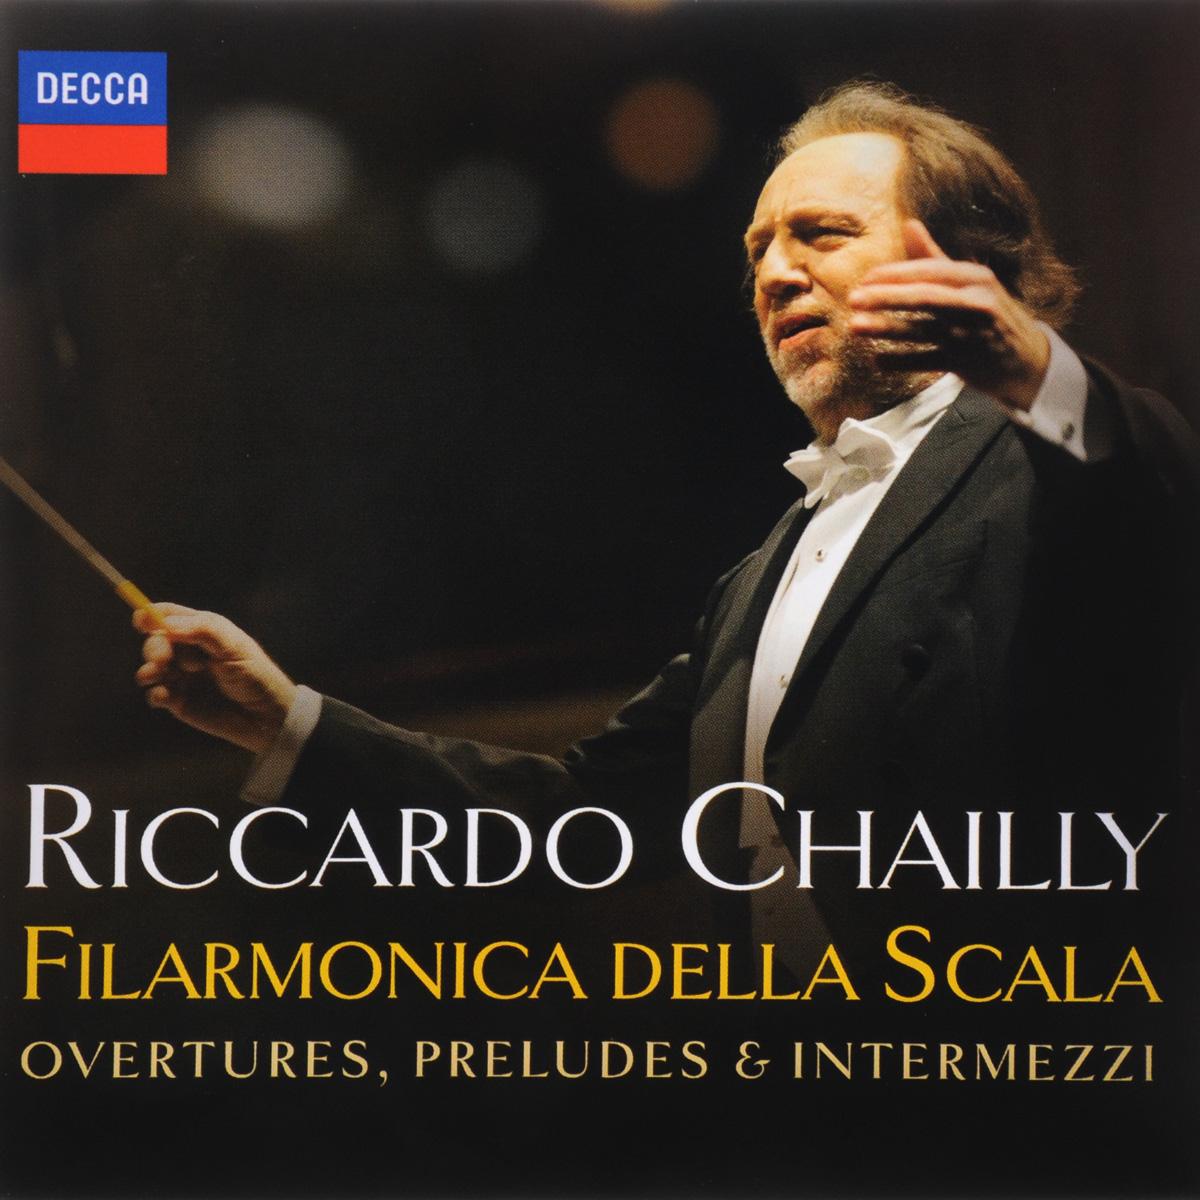 Риккардо Шайи,Filarmonica Della Scala Riccardo Chailly, Filarmonica Della Scala. Overtures, Preludes & Intermezzi все цены